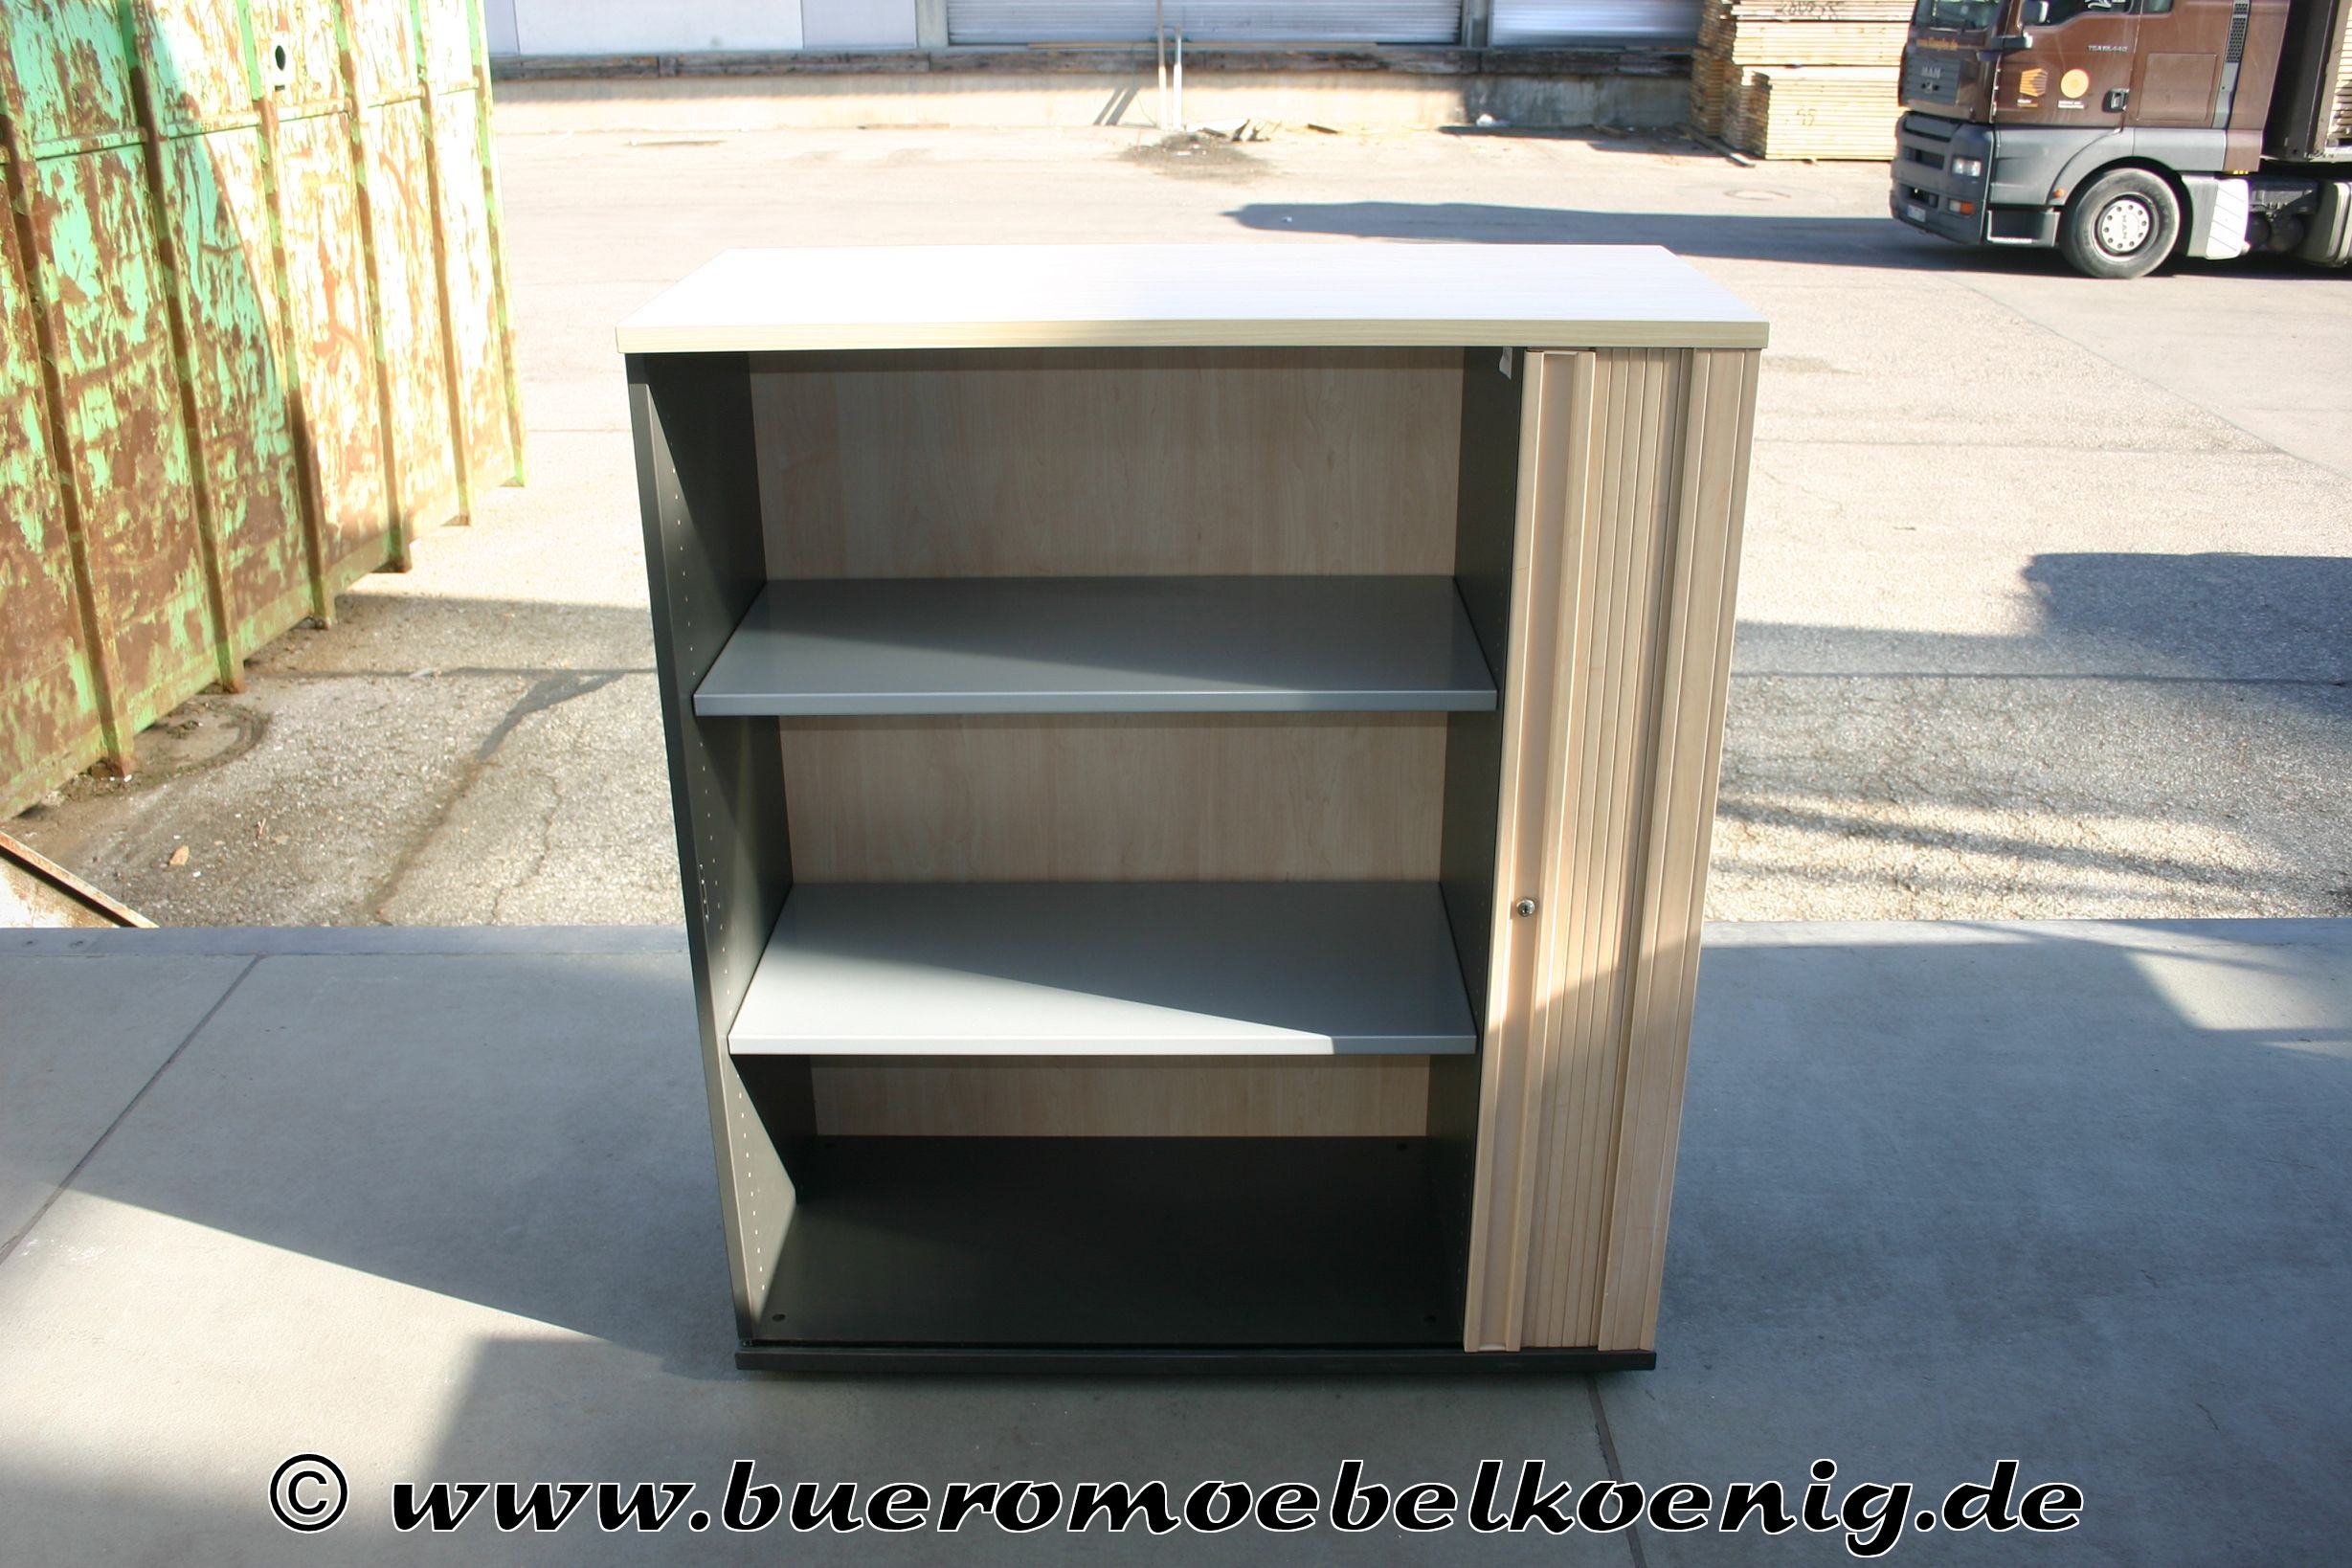 sideboard mit querrolladen 3 oh in apfel von dyes haworth. Black Bedroom Furniture Sets. Home Design Ideas